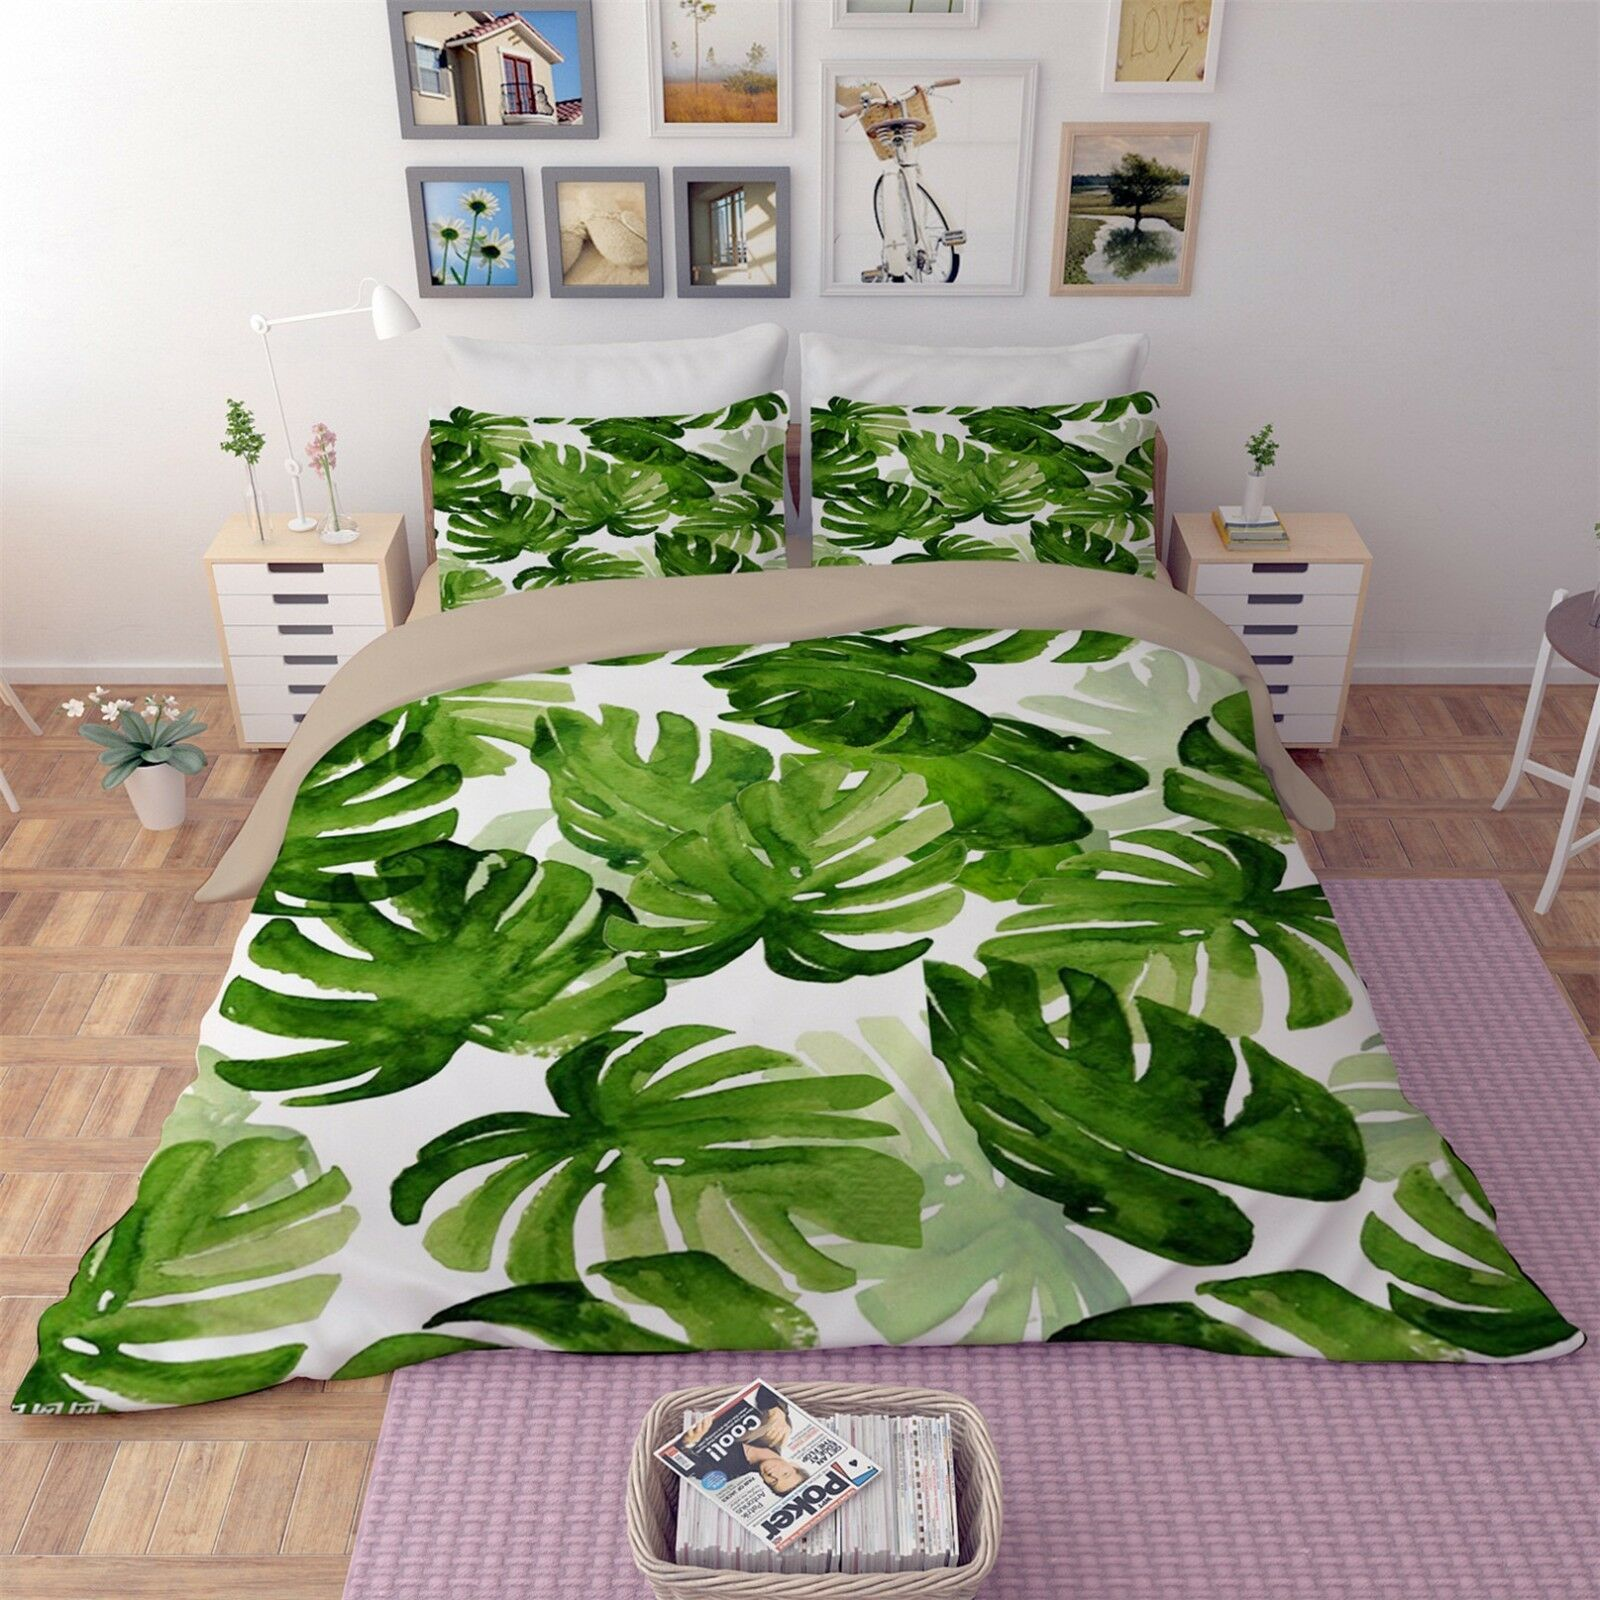 3D Grün Leaf 4 Bed Pillowcases Quilt Duvet Cover Set Single Queen King AU Carly